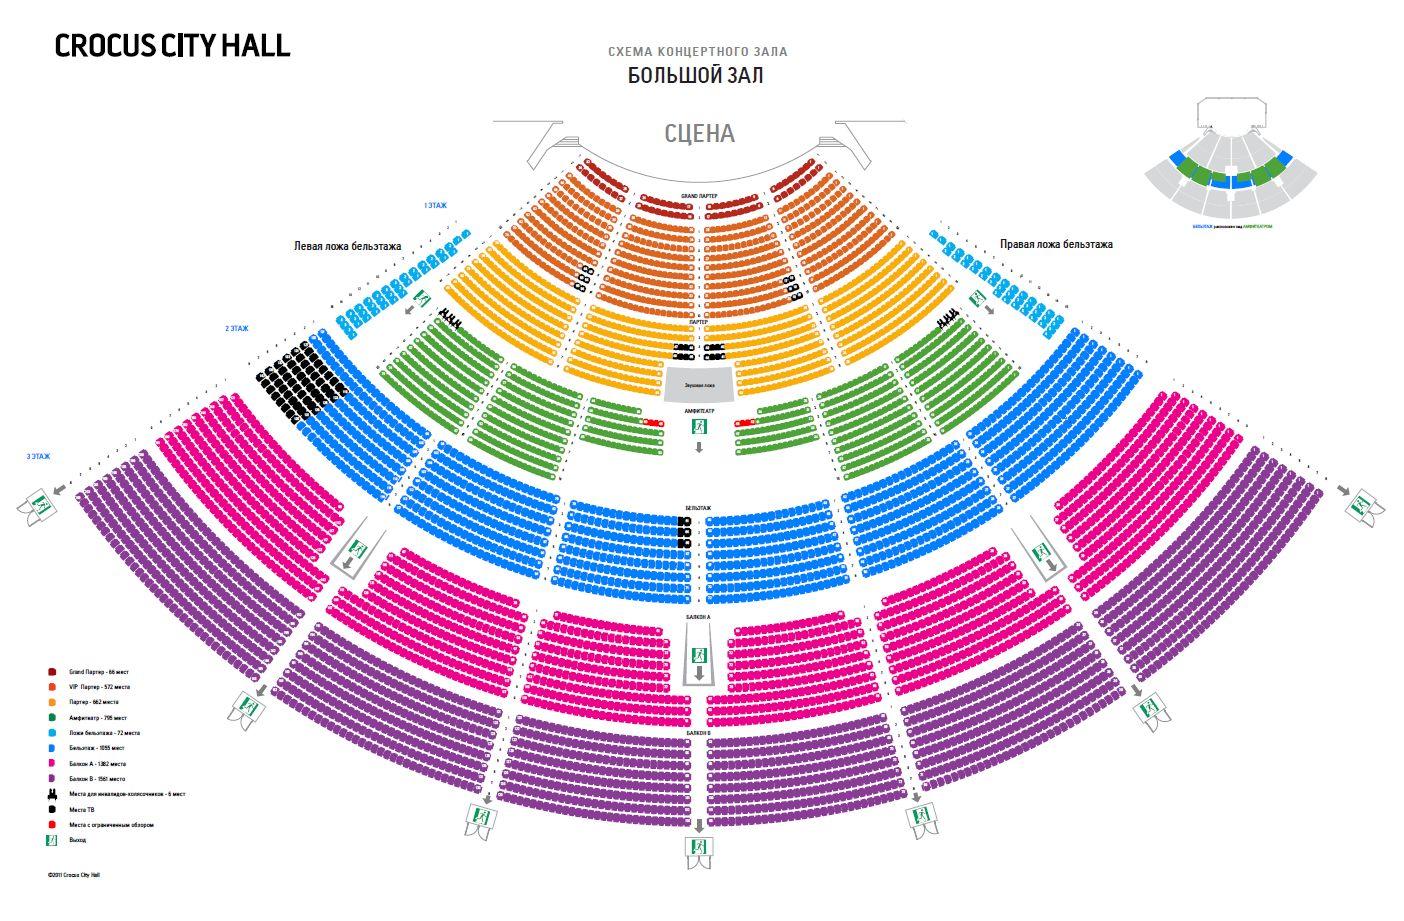 Концертный зал крокус сити холл схема